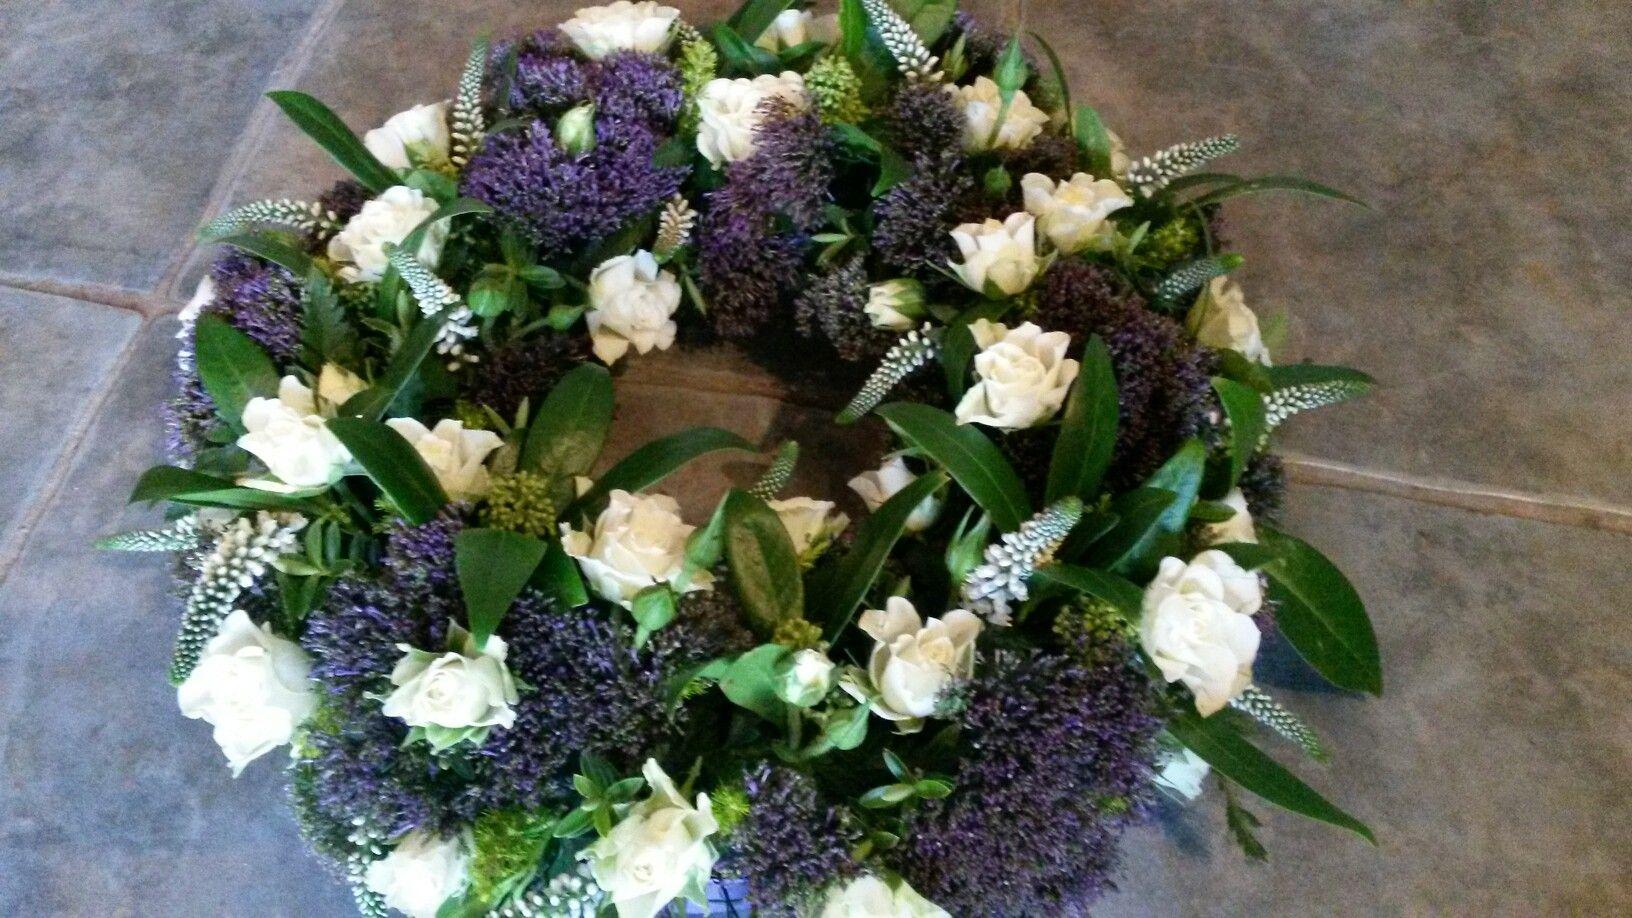 Sympathy funeral tribute in purple and white funeral flowers sympathy funeral tribute in purple and white izmirmasajfo